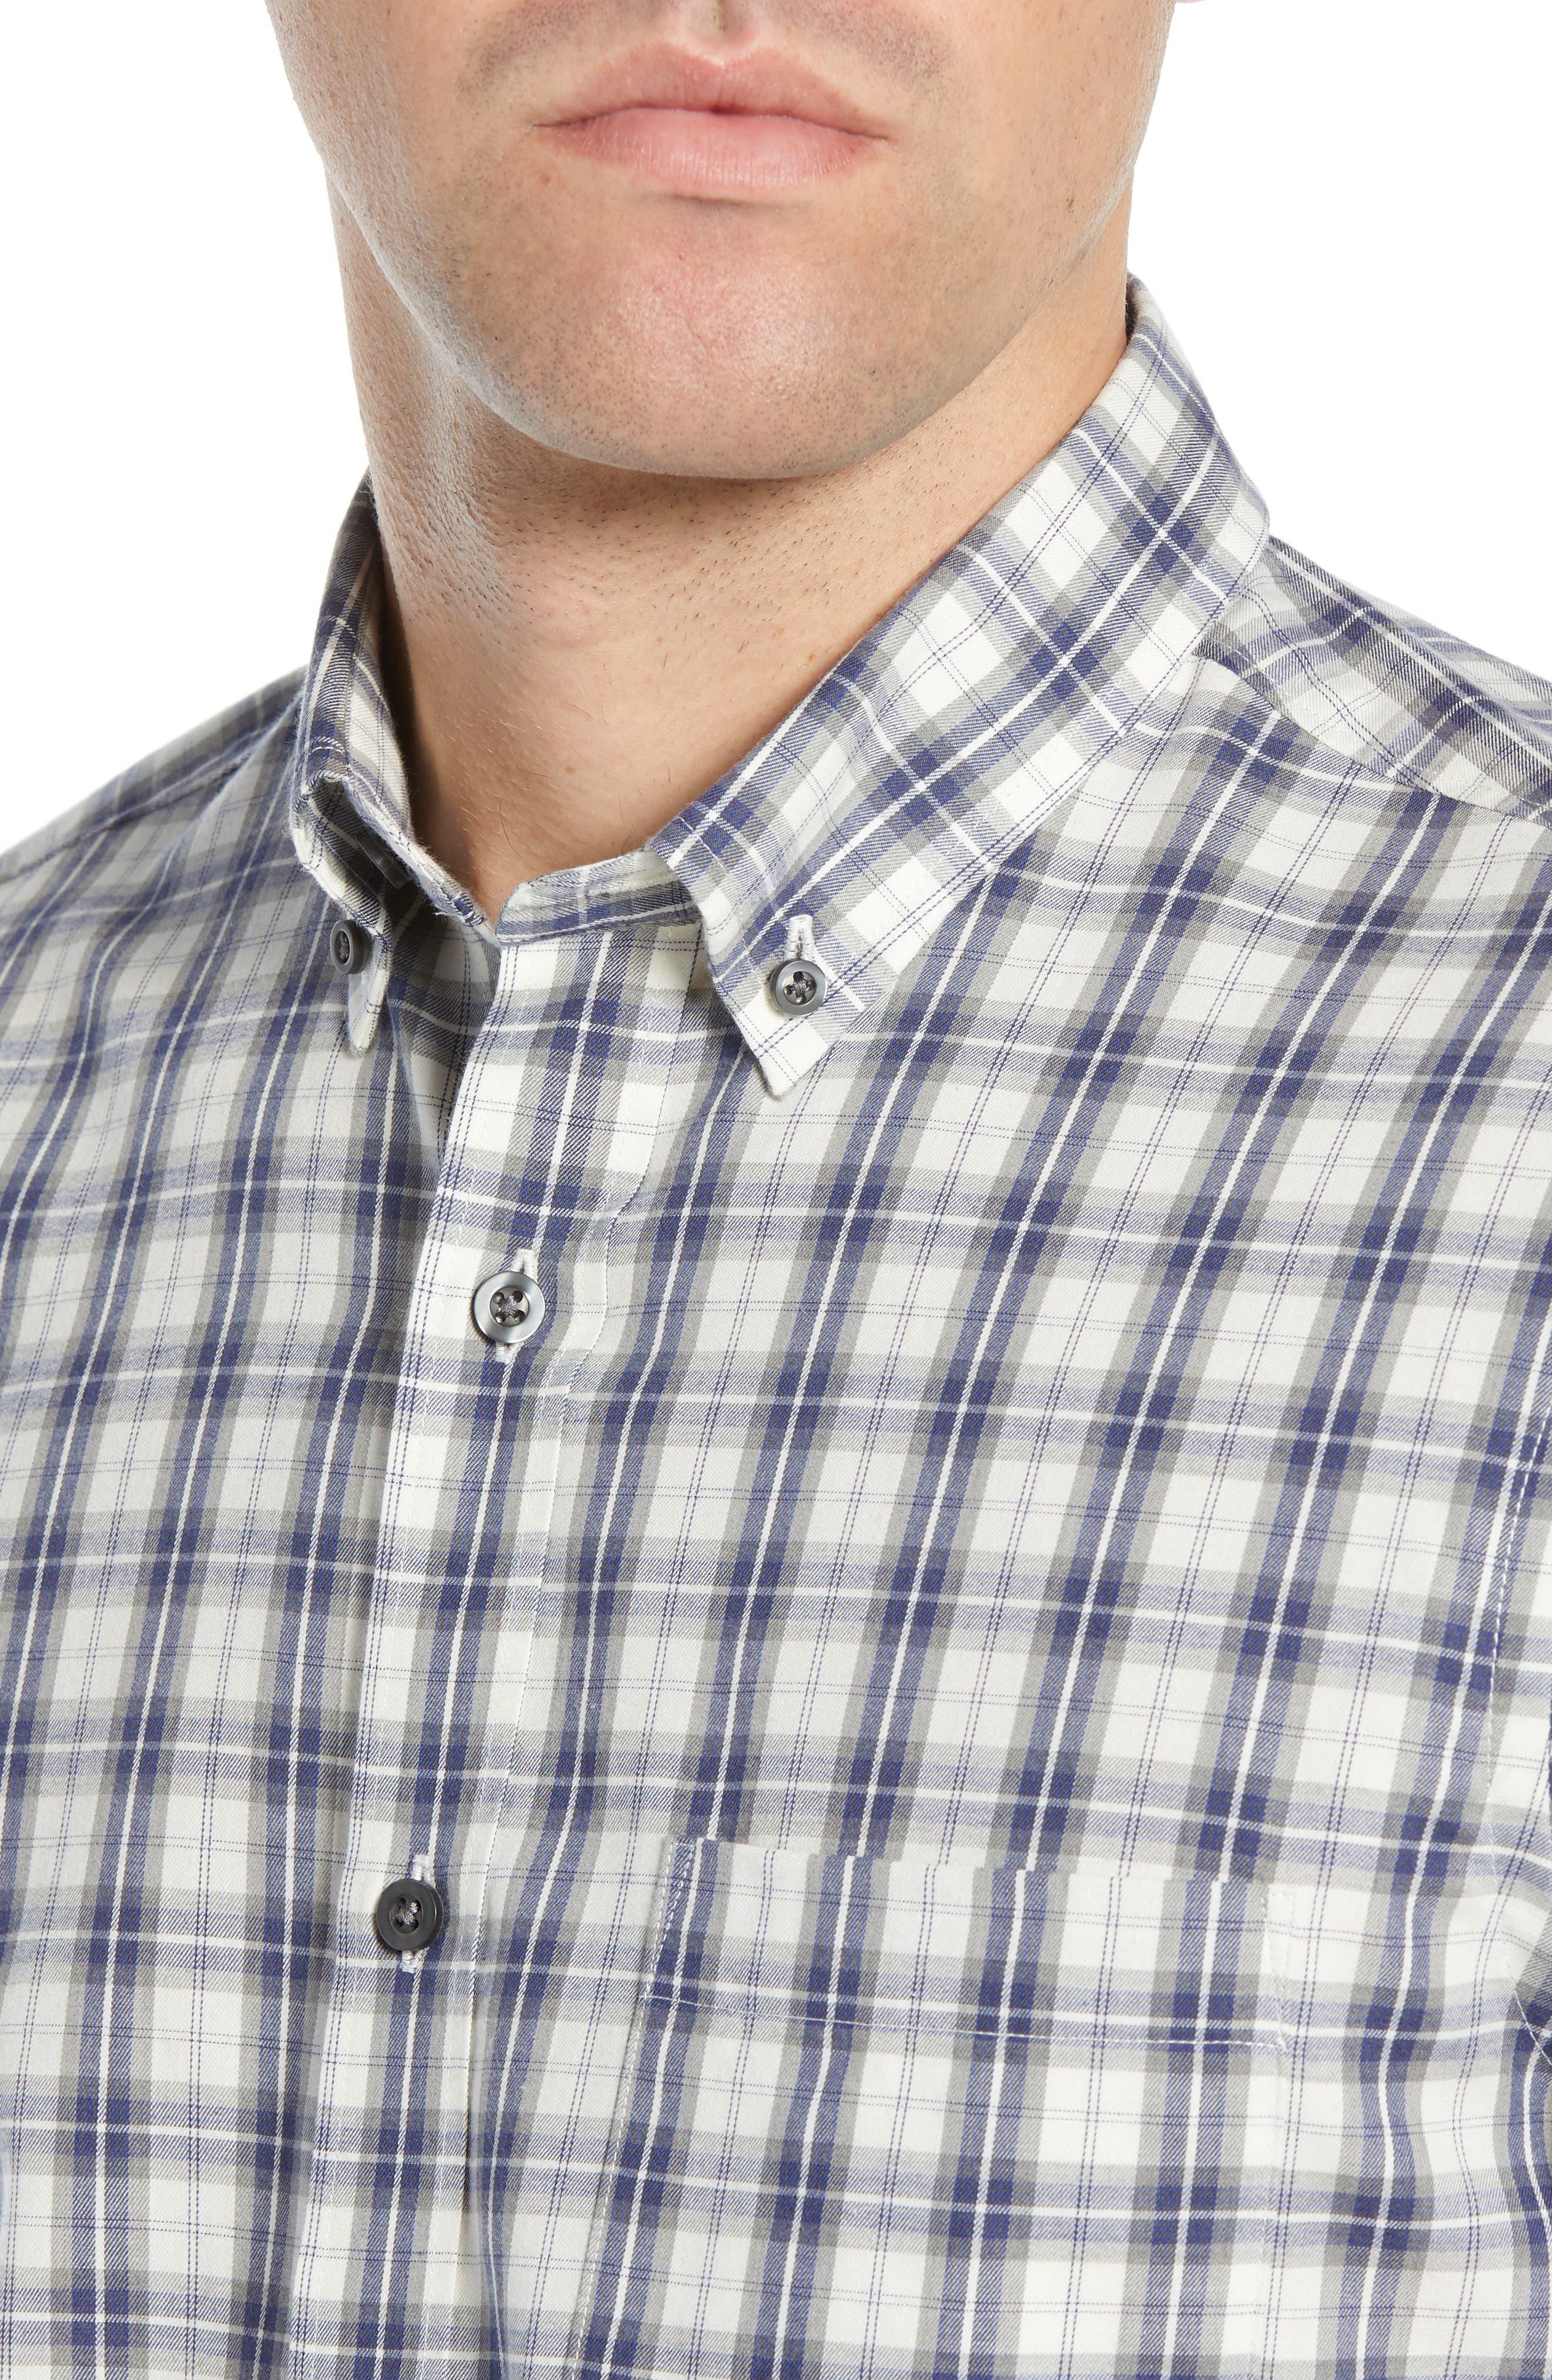 Slim Fit Plaid Sport Shirt,                             Alternate thumbnail 2, color,                             WHITE BLUE ENSIGN GREY PLAID